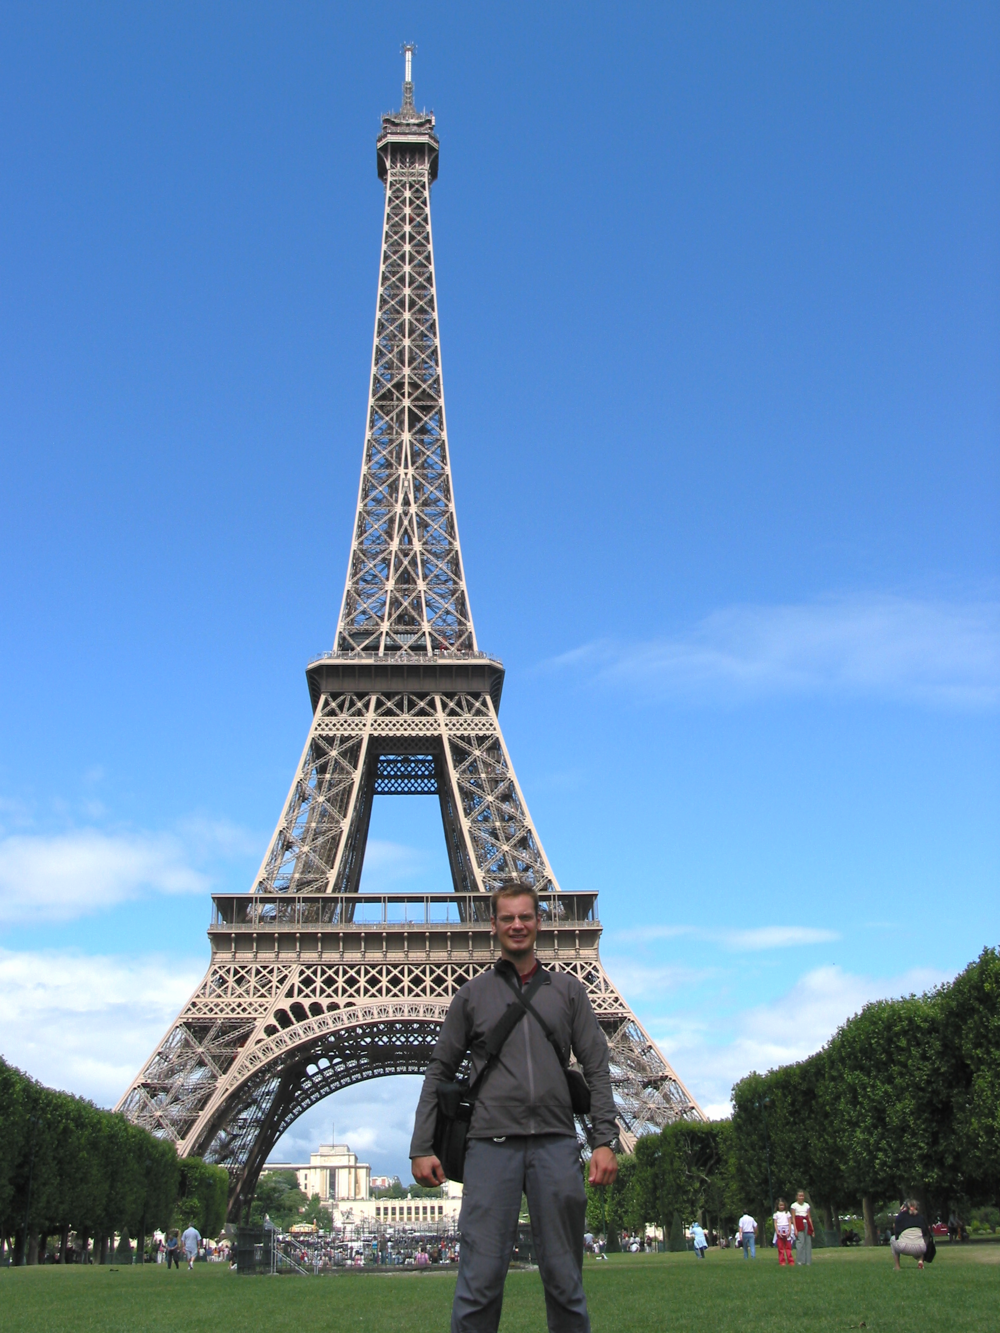 Ben at the Eiffel Tower, Paris